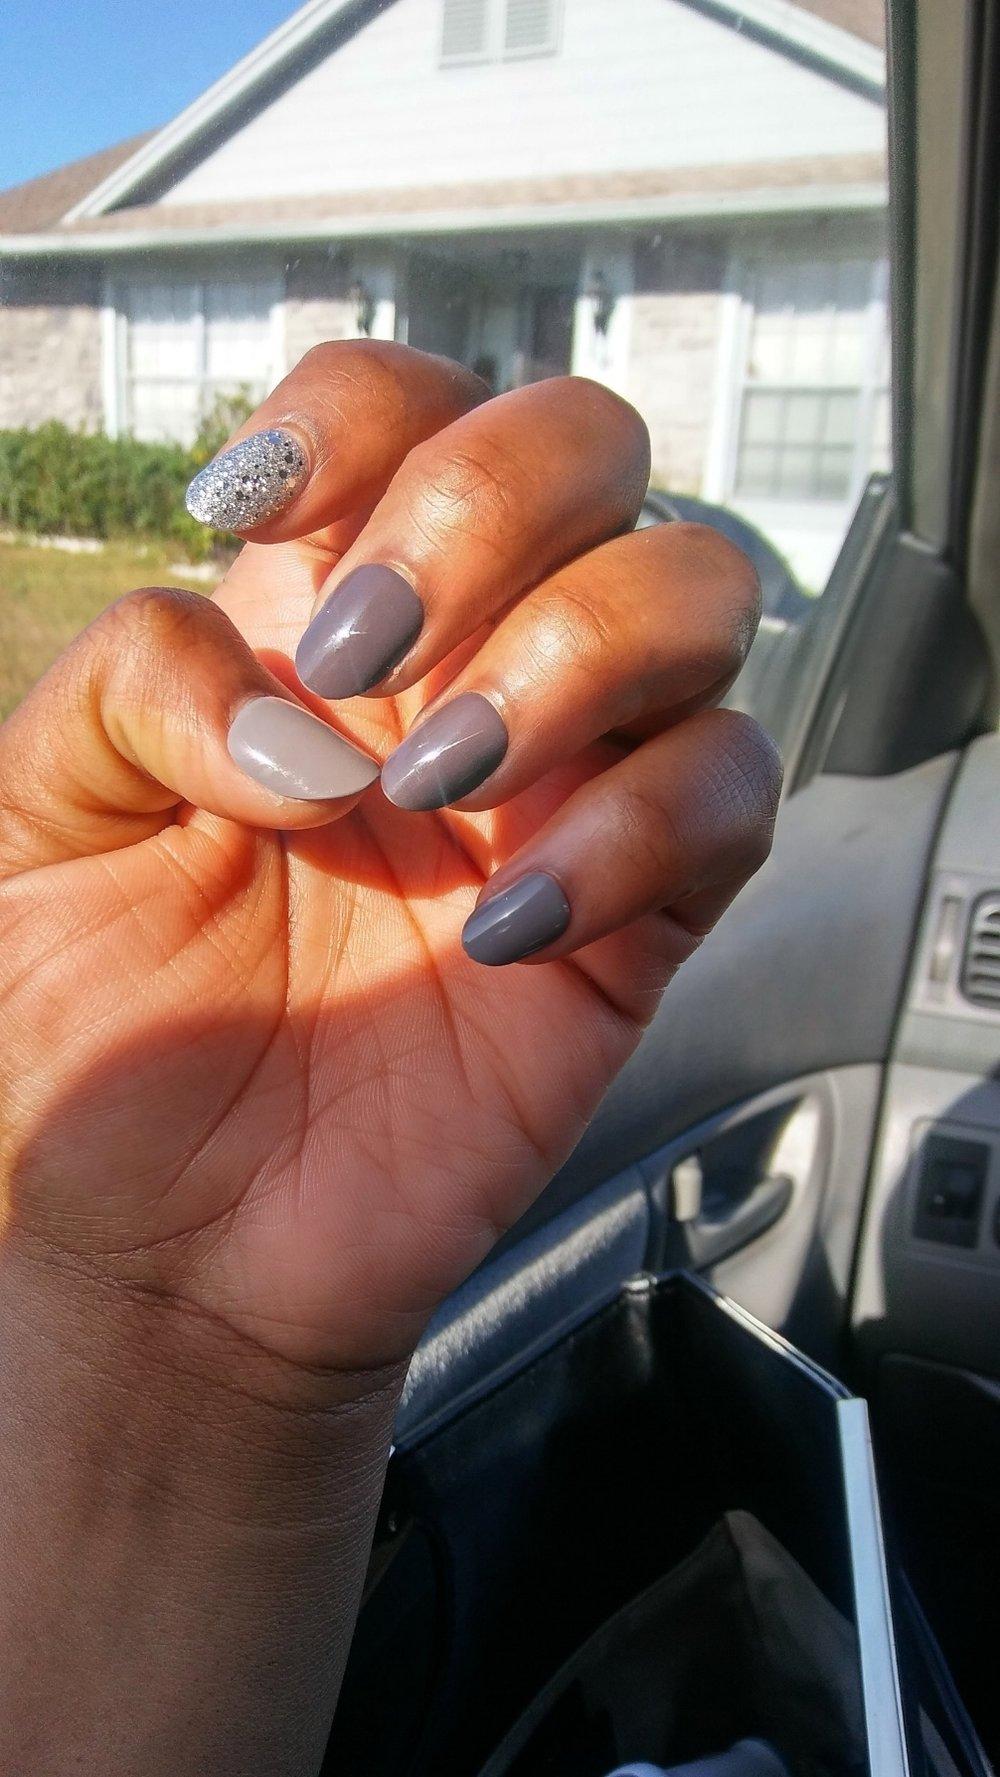 Nails 1.jpg